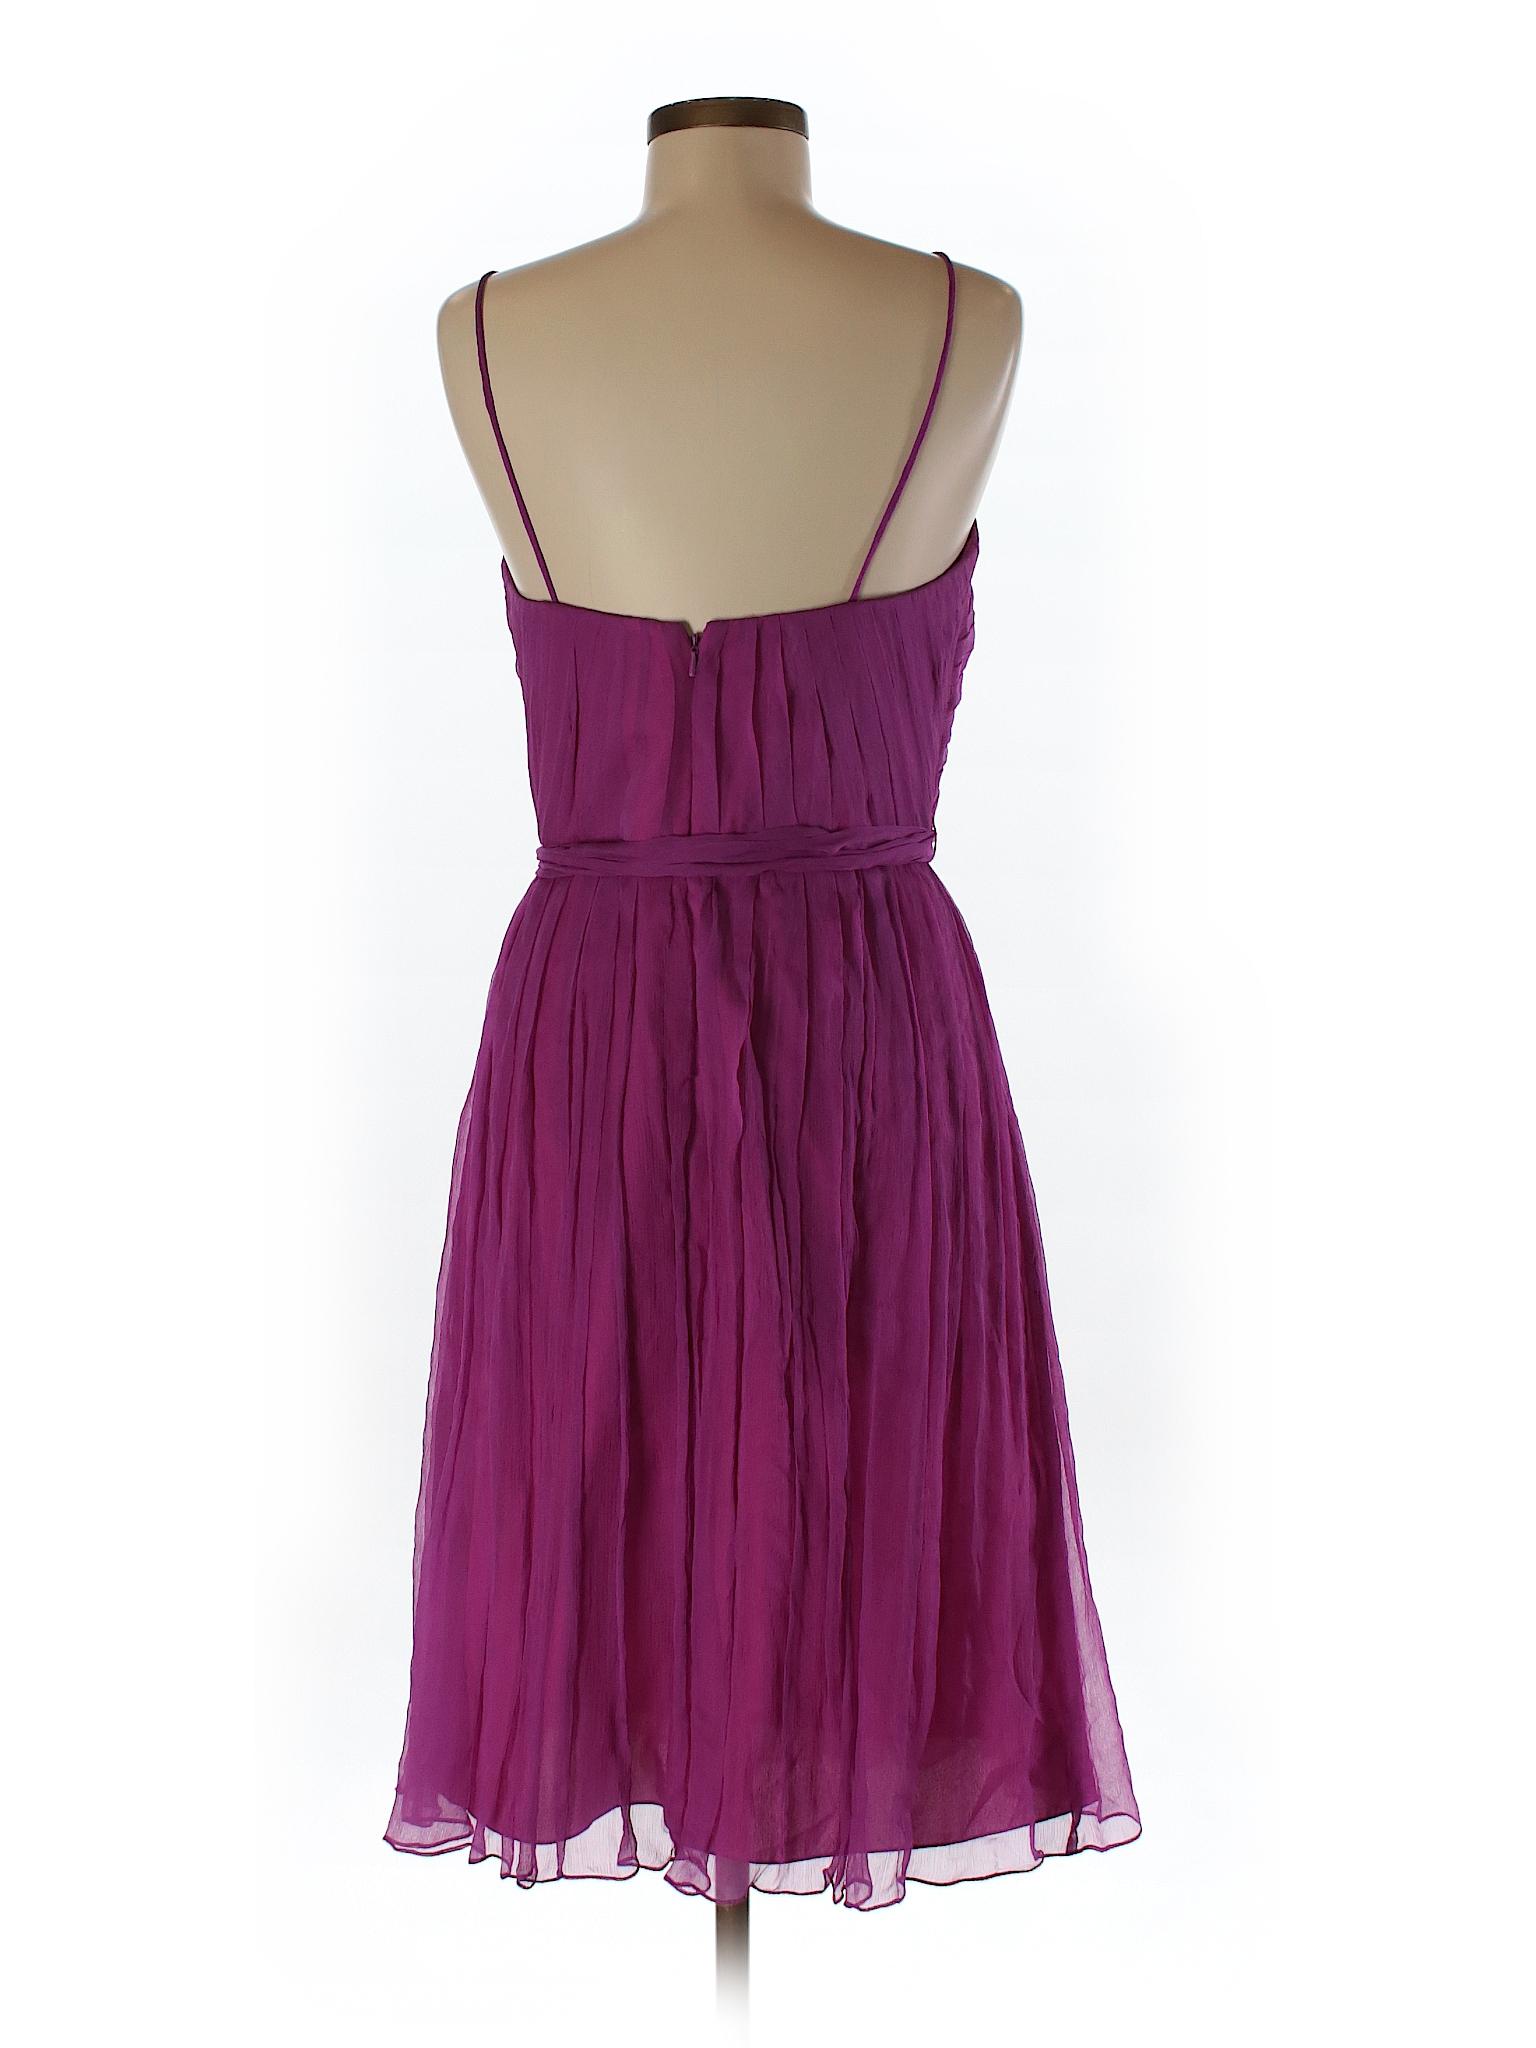 Dress amp; Selling Watters Watters Silk vPw6n1xqZ8